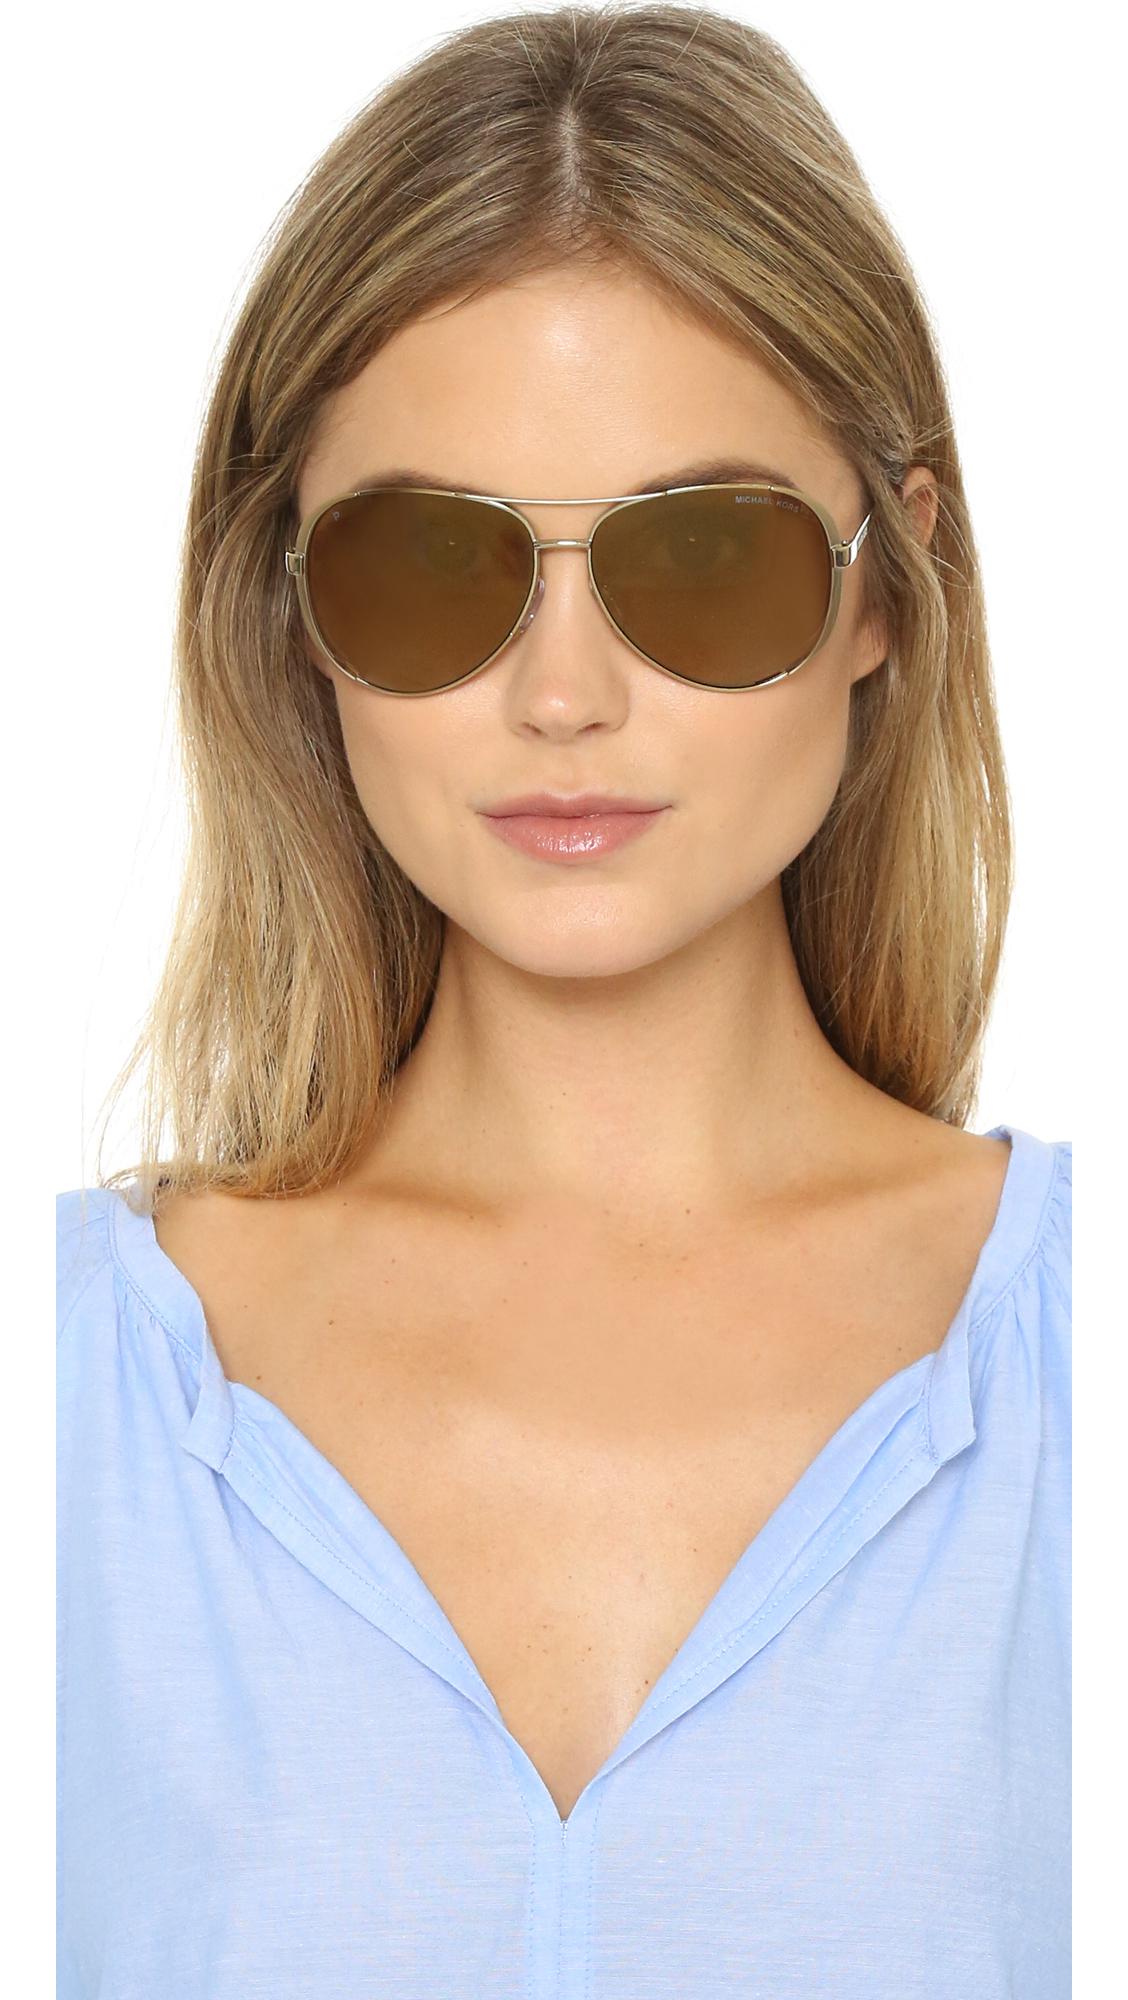 Lyst Michael Kors Chelsea Polarized Sunglasses Gold